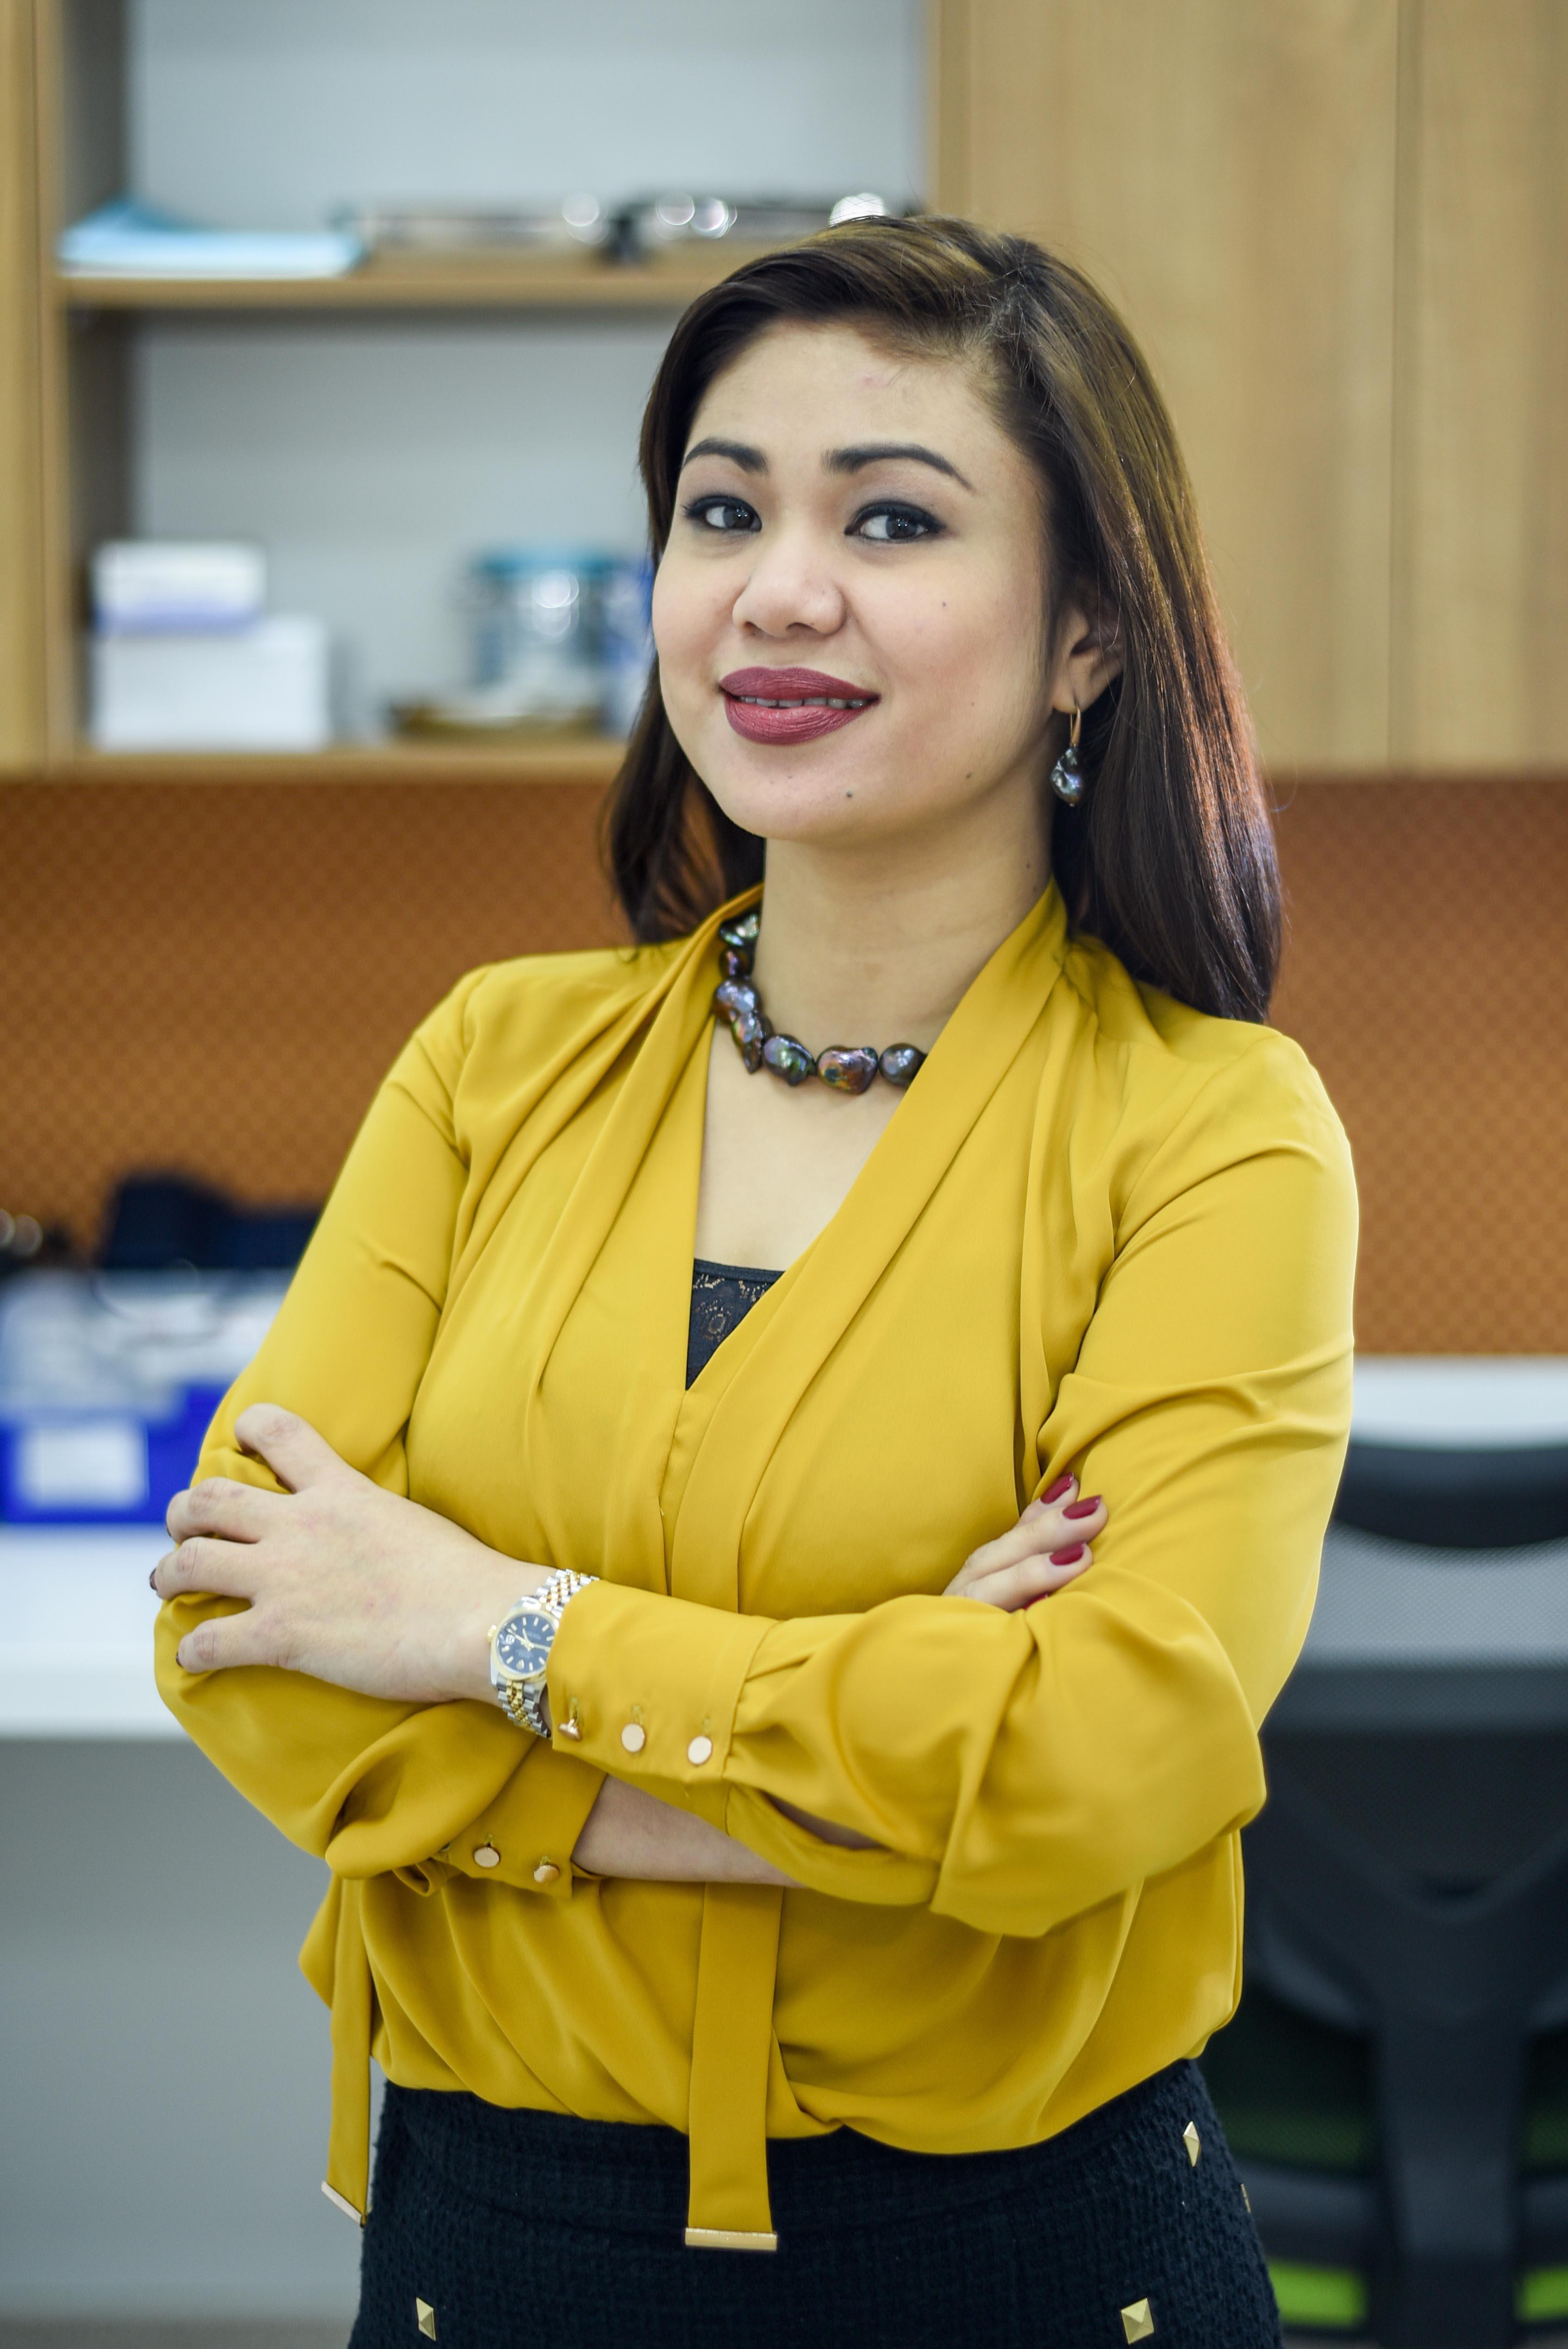 Dr Rebecca Desiderio, Chief Executive Officer, The Medical City, Dubai